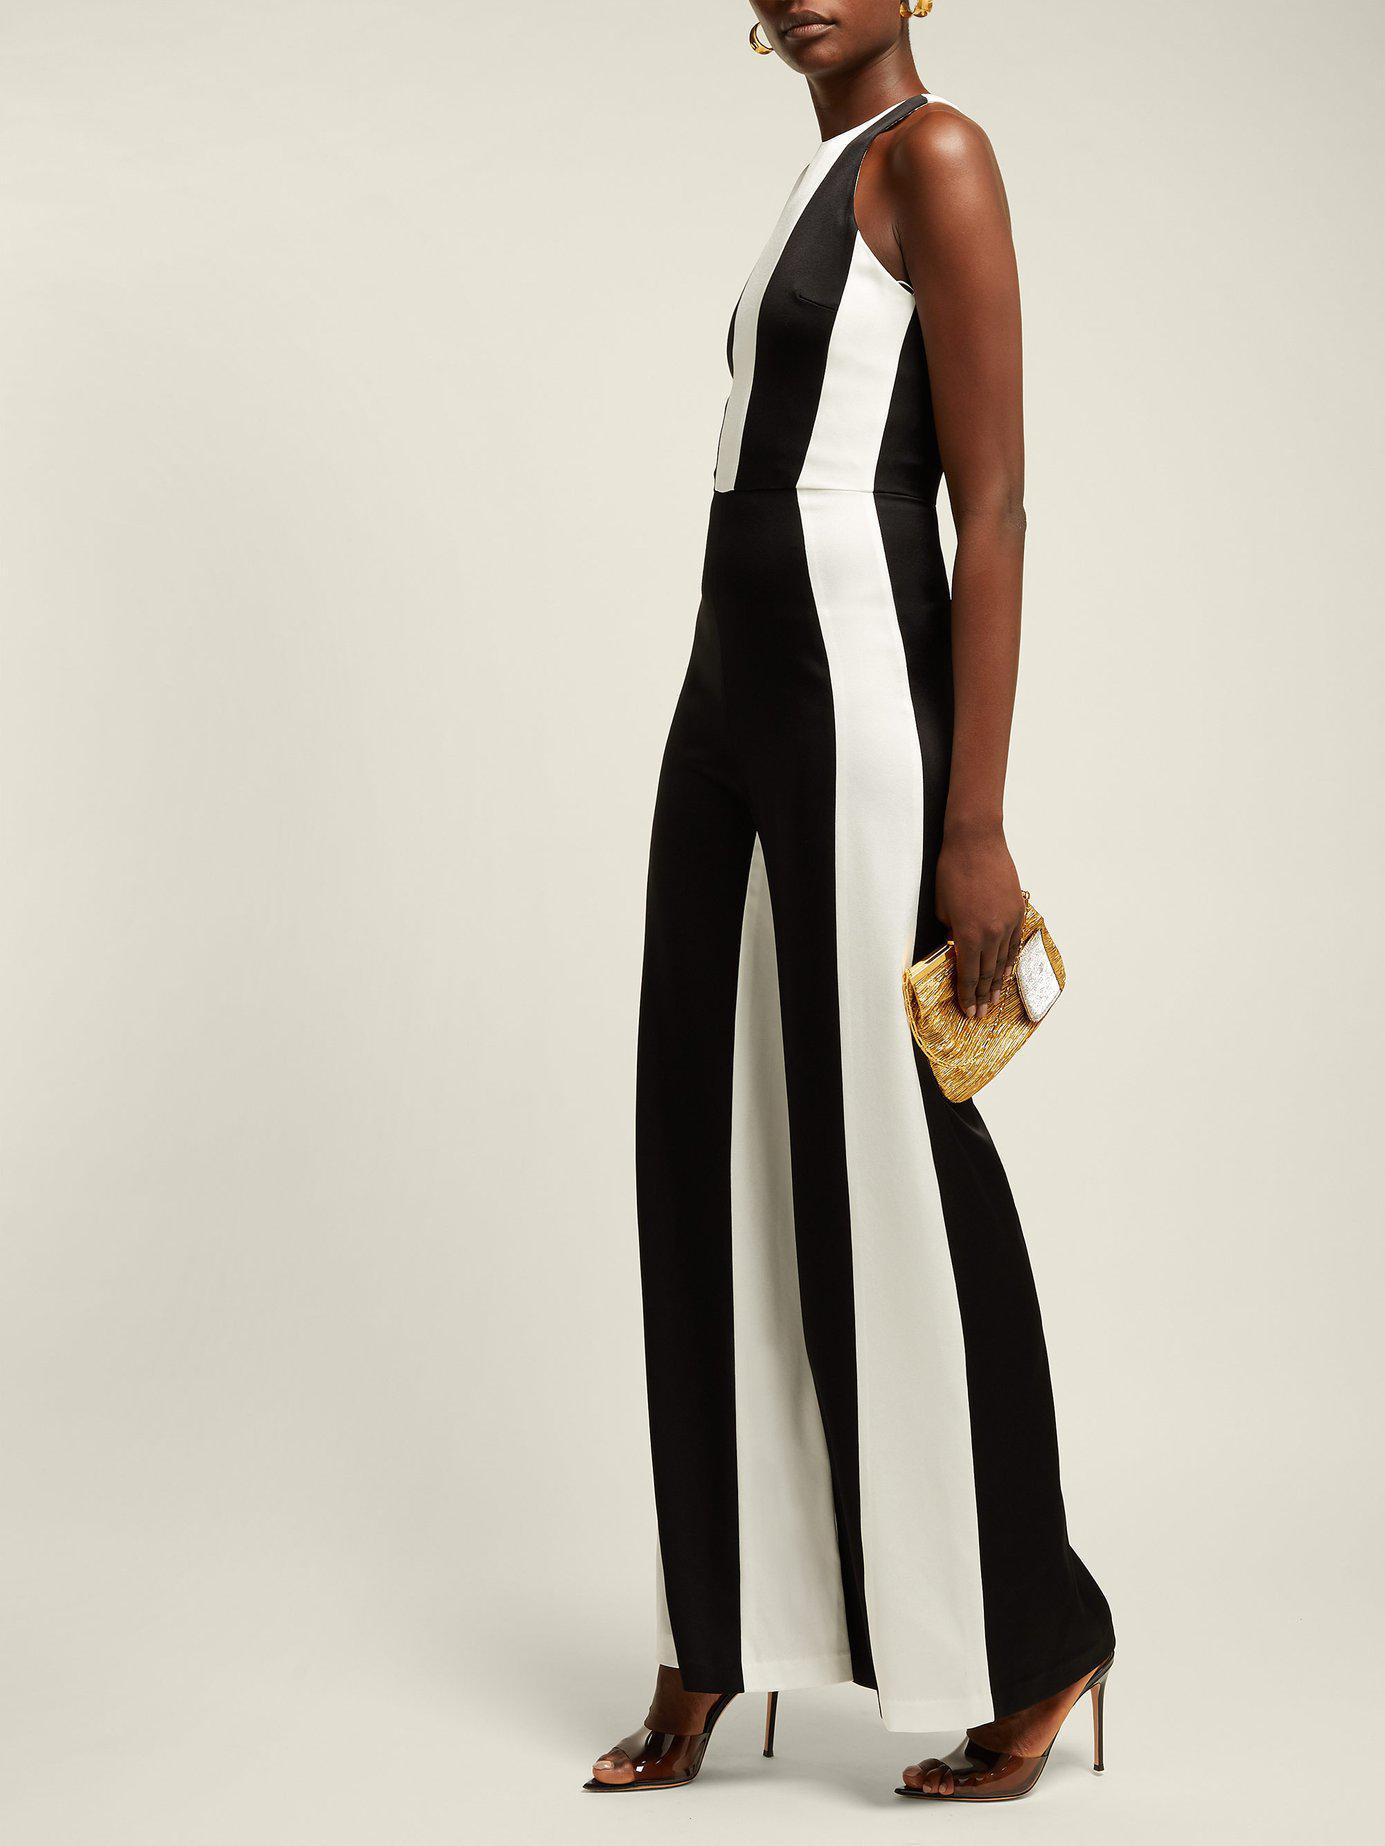 c86e4a69d9c Lyst - Galvan London Marlene Panelled Crepe Jumpsuit in Black